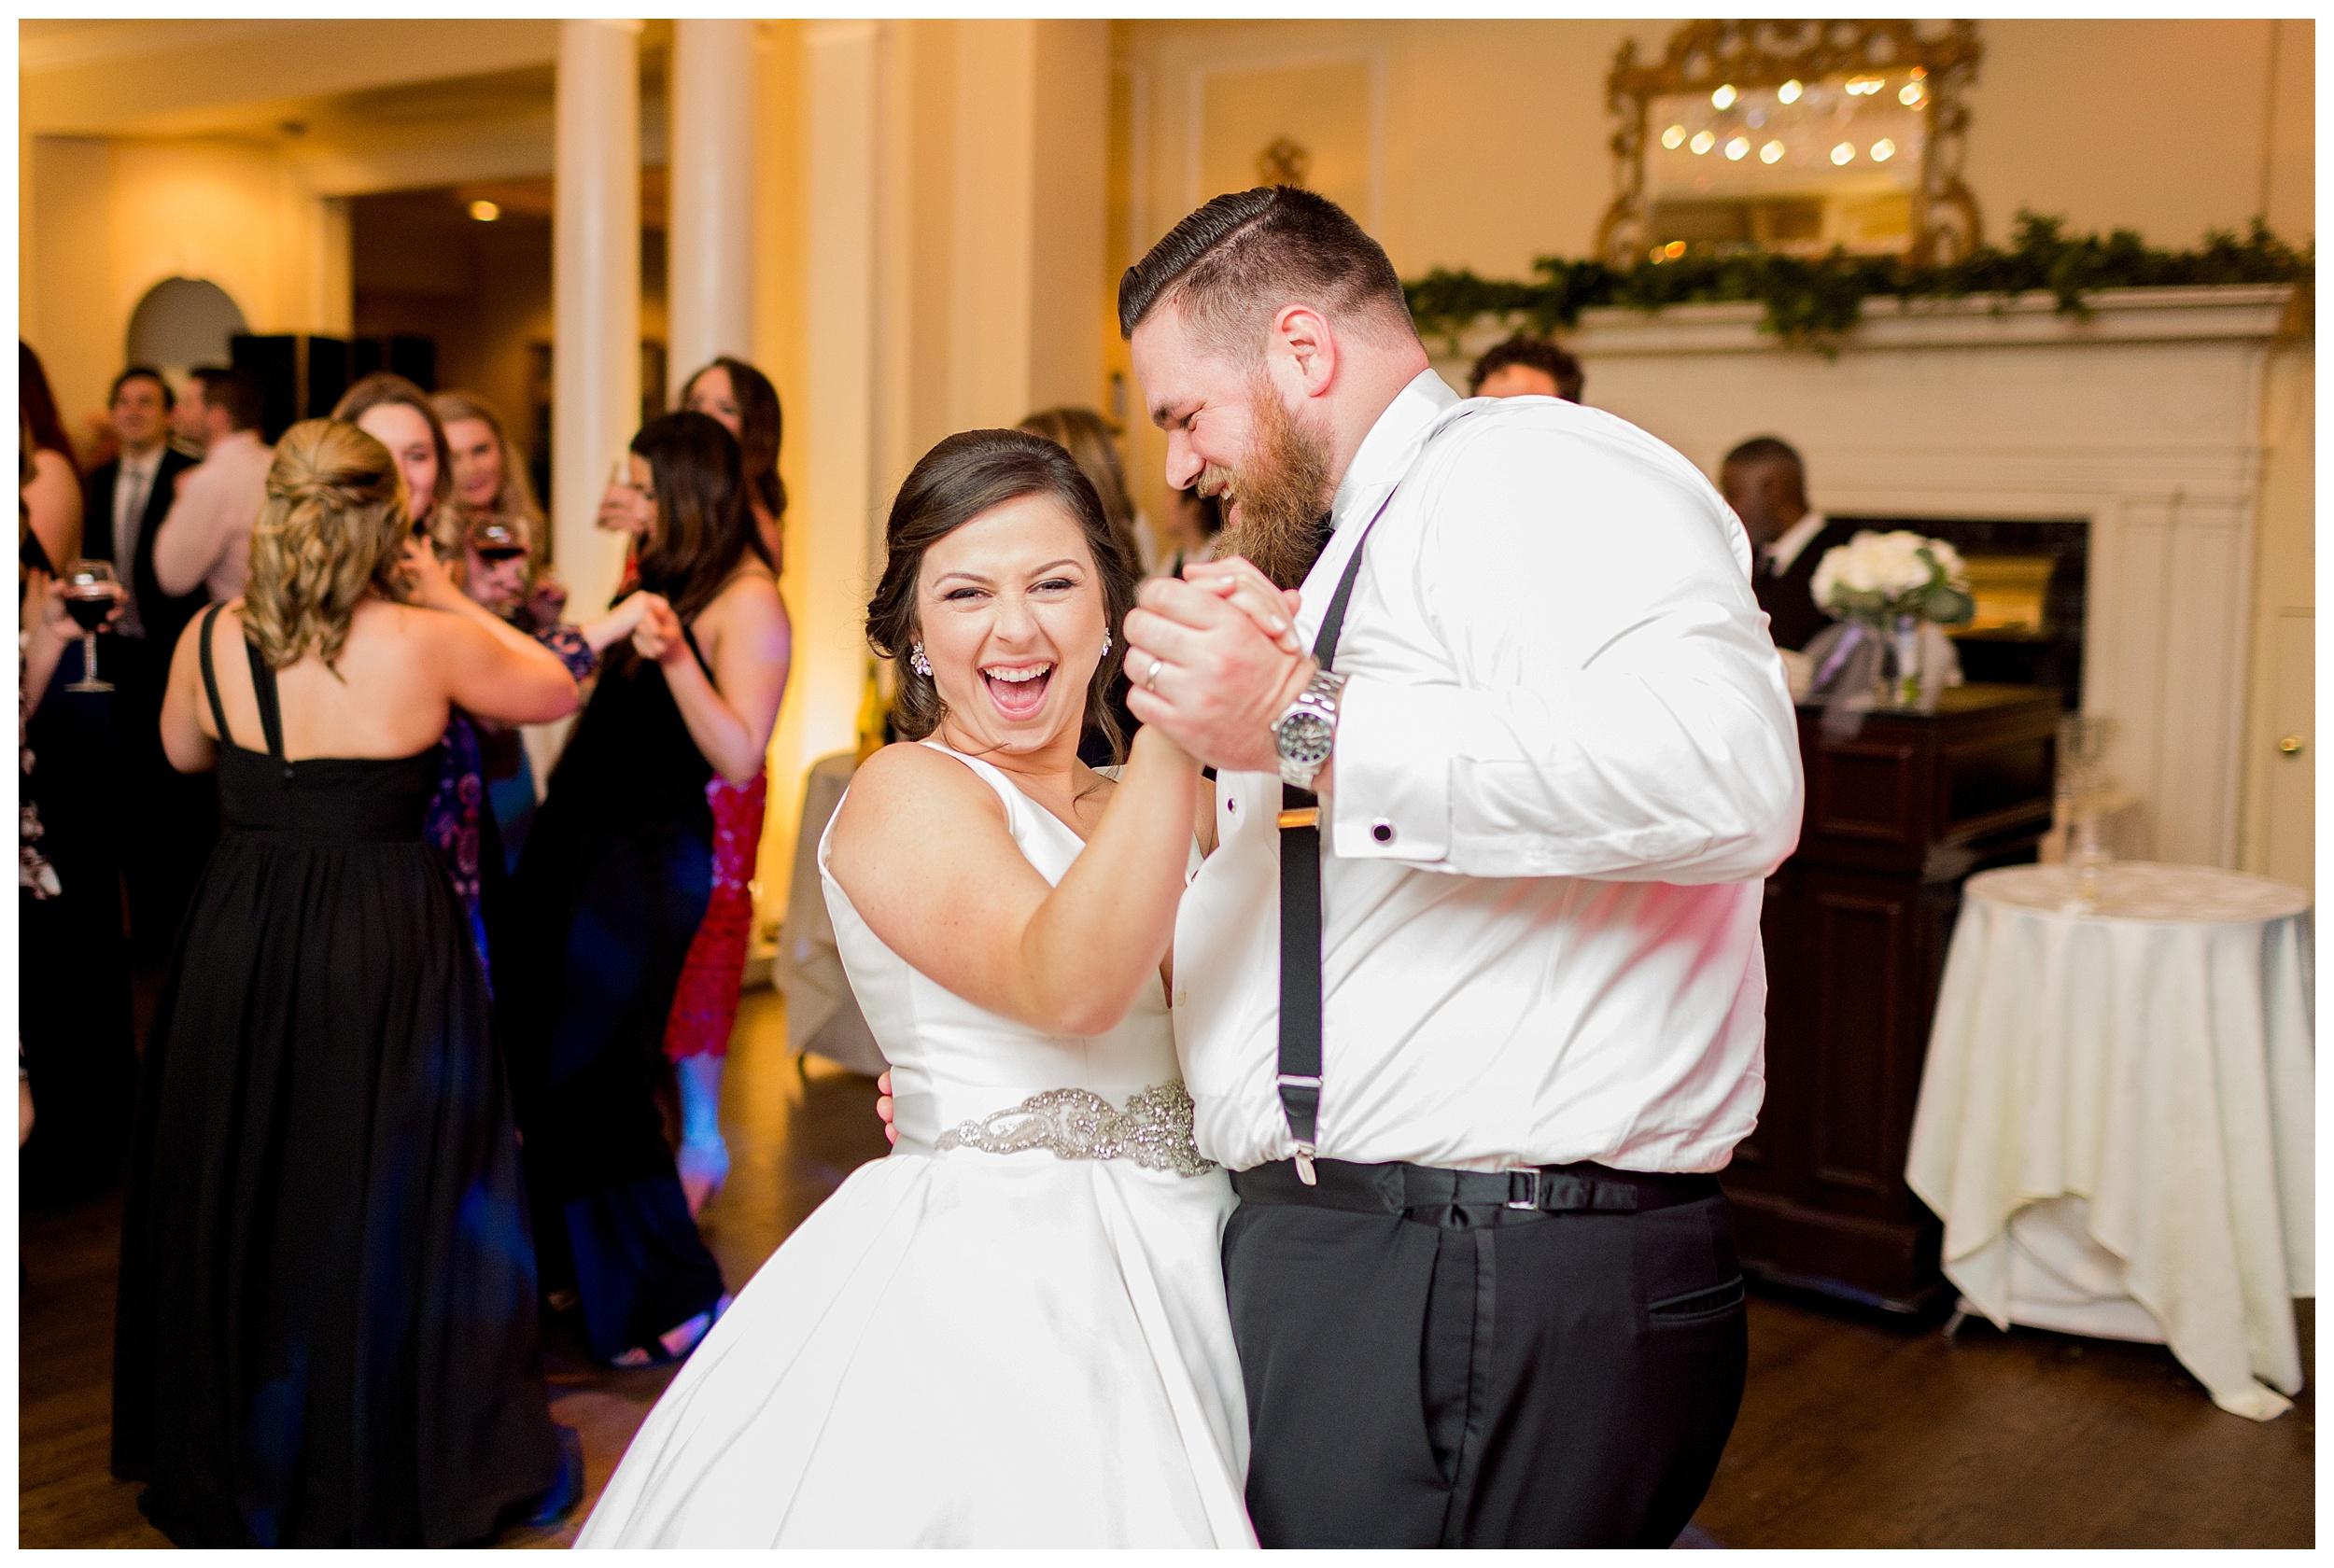 Country Club of Virginia Wedding | Richmond Wedding Photographer_0153.jpg